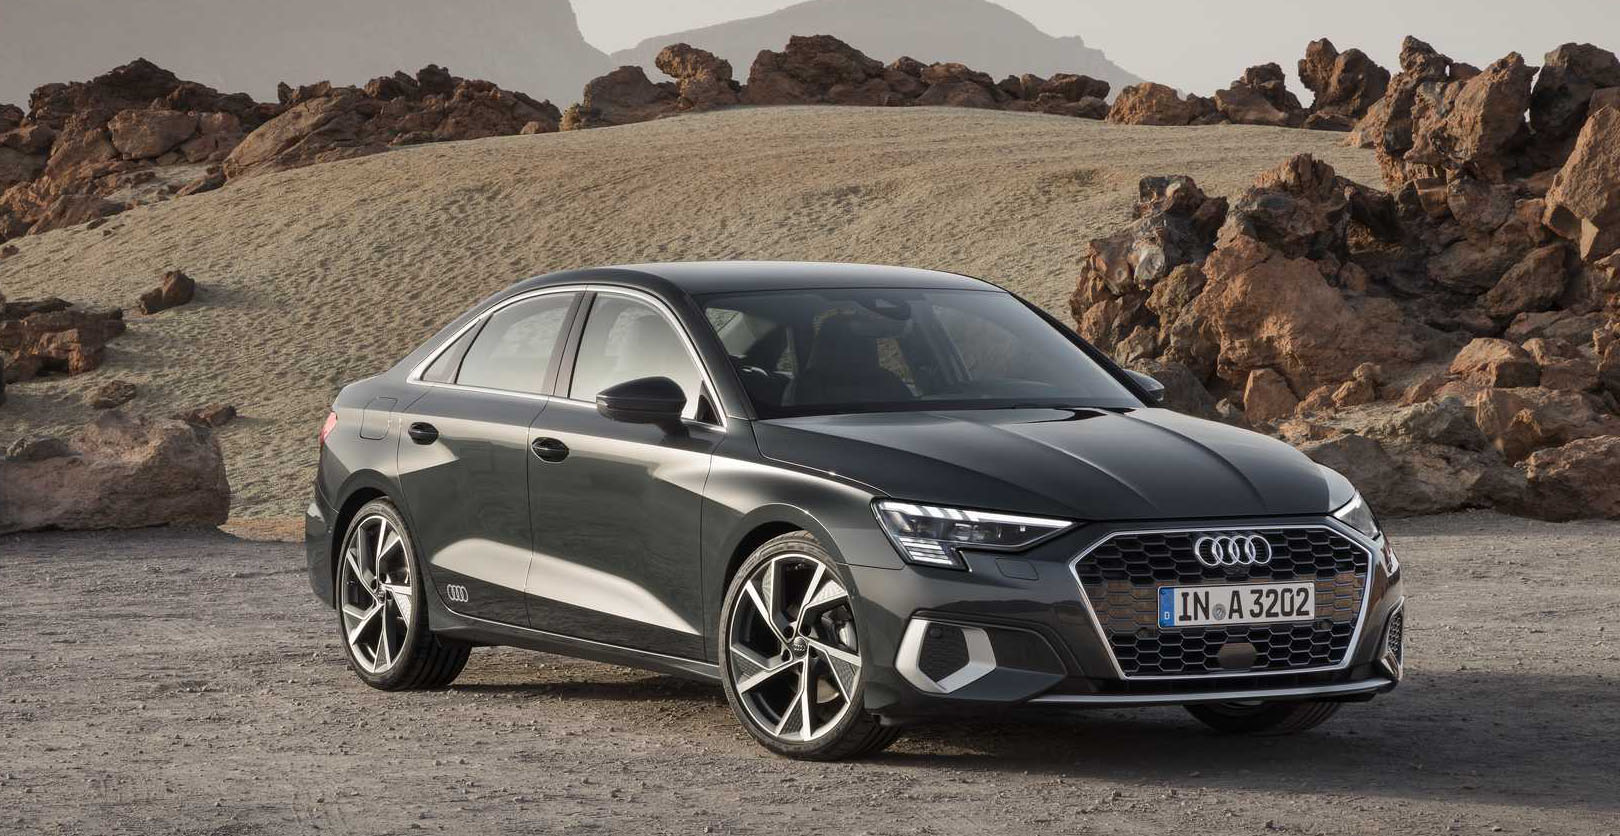 2021-audi-a3-sedan-debut-5.jpg